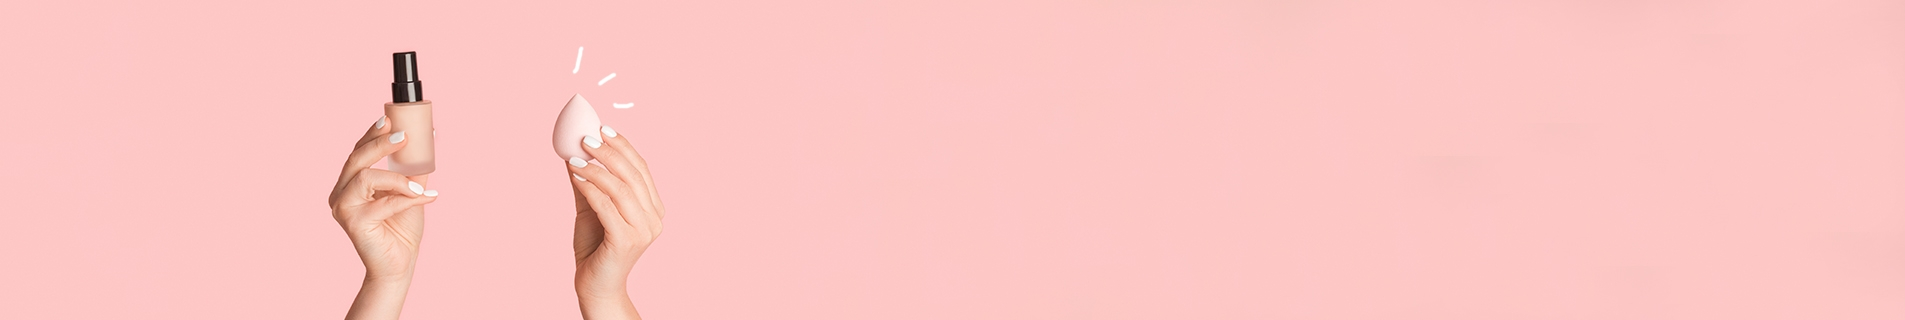 Gloss pas cher | Maquillage lèvres | SAGA Cosmetics